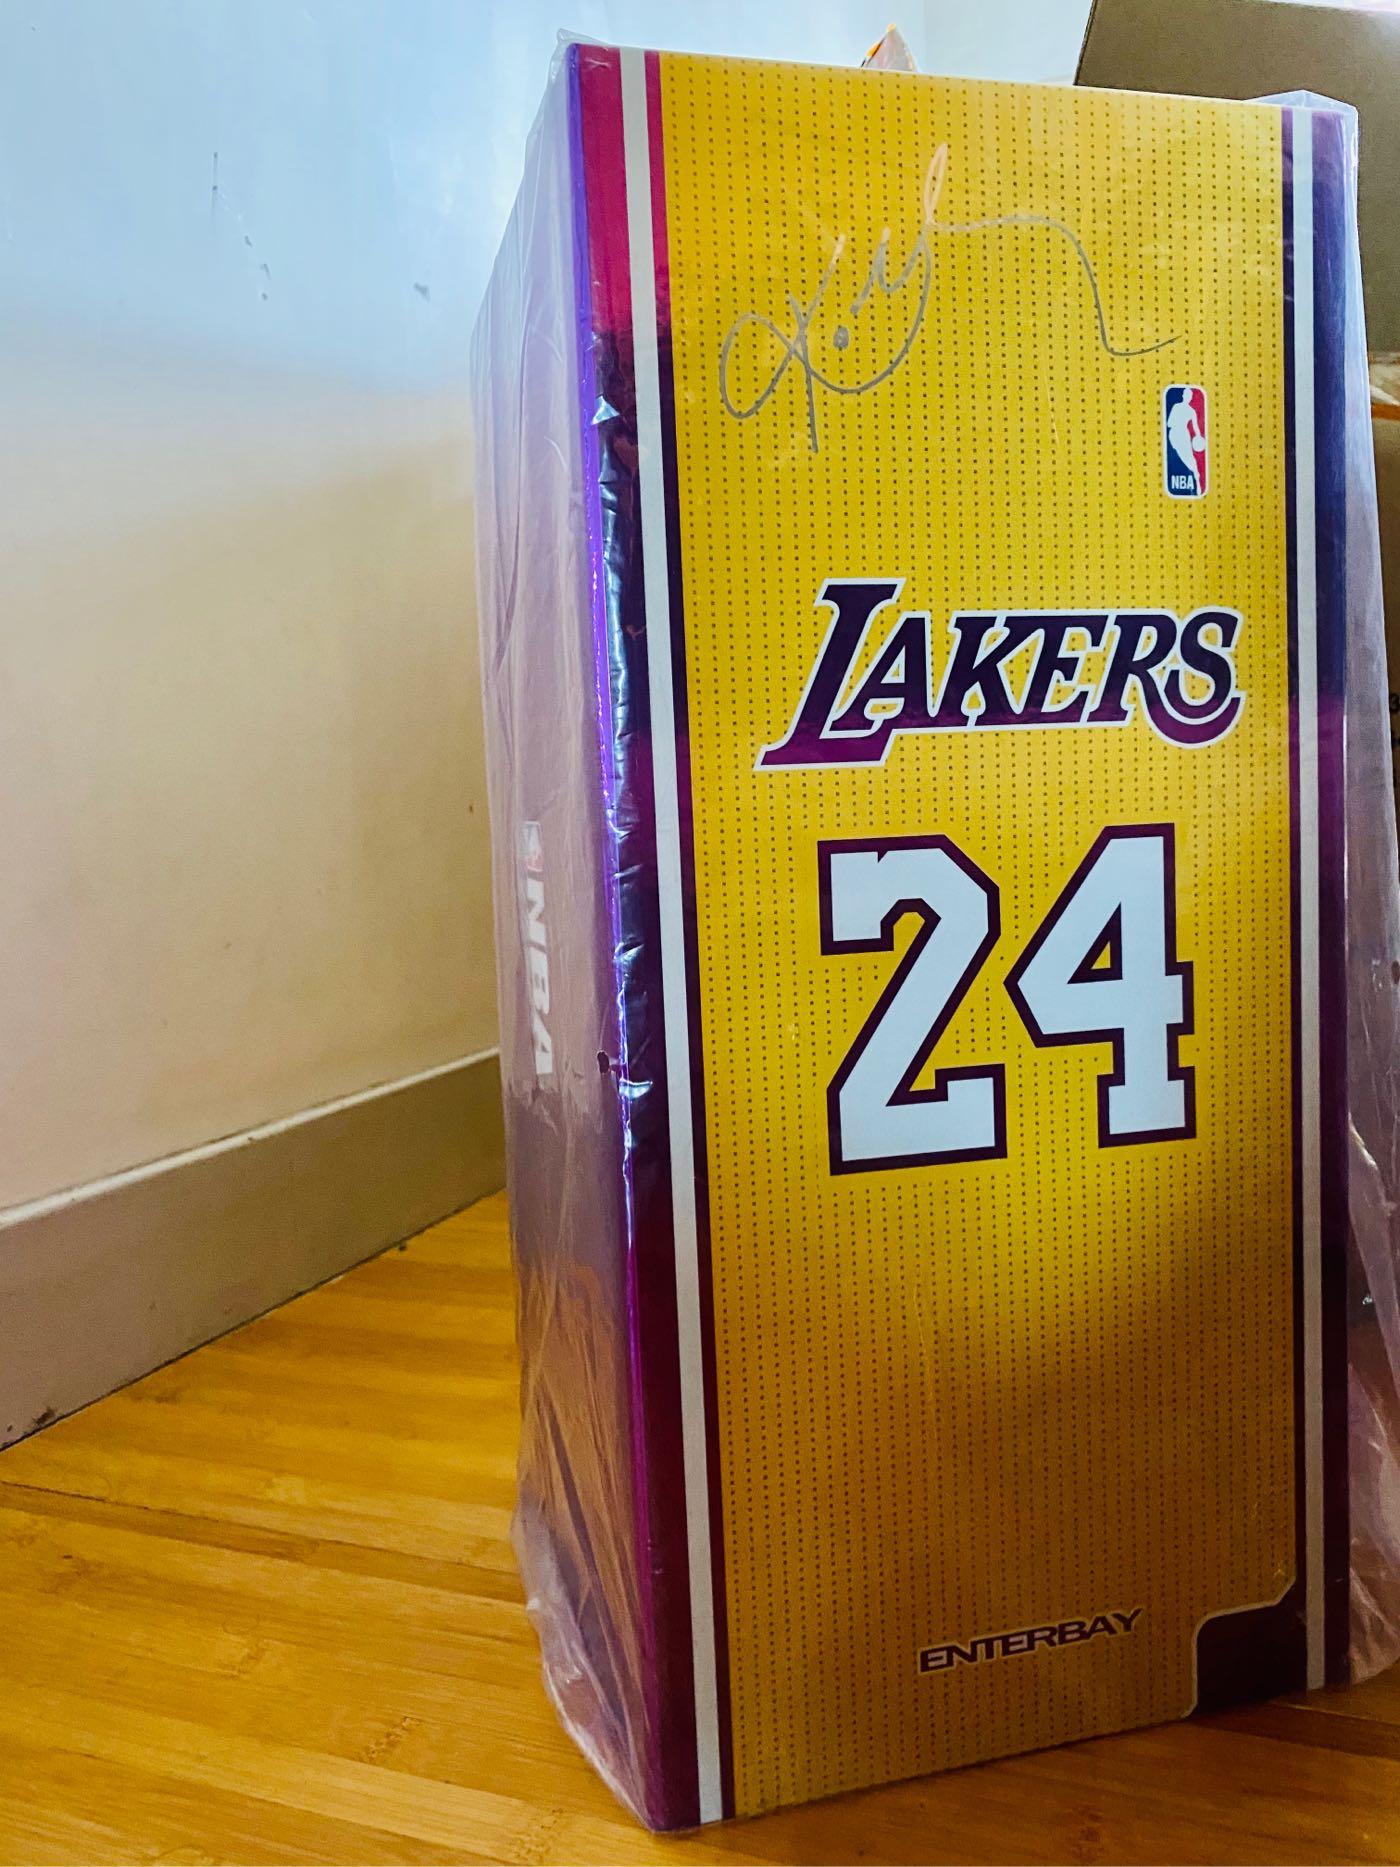 ENTERBAY Real Masterpiece: NBA 1/6 Kobe Bryant 人偶 公仔 全新未拆